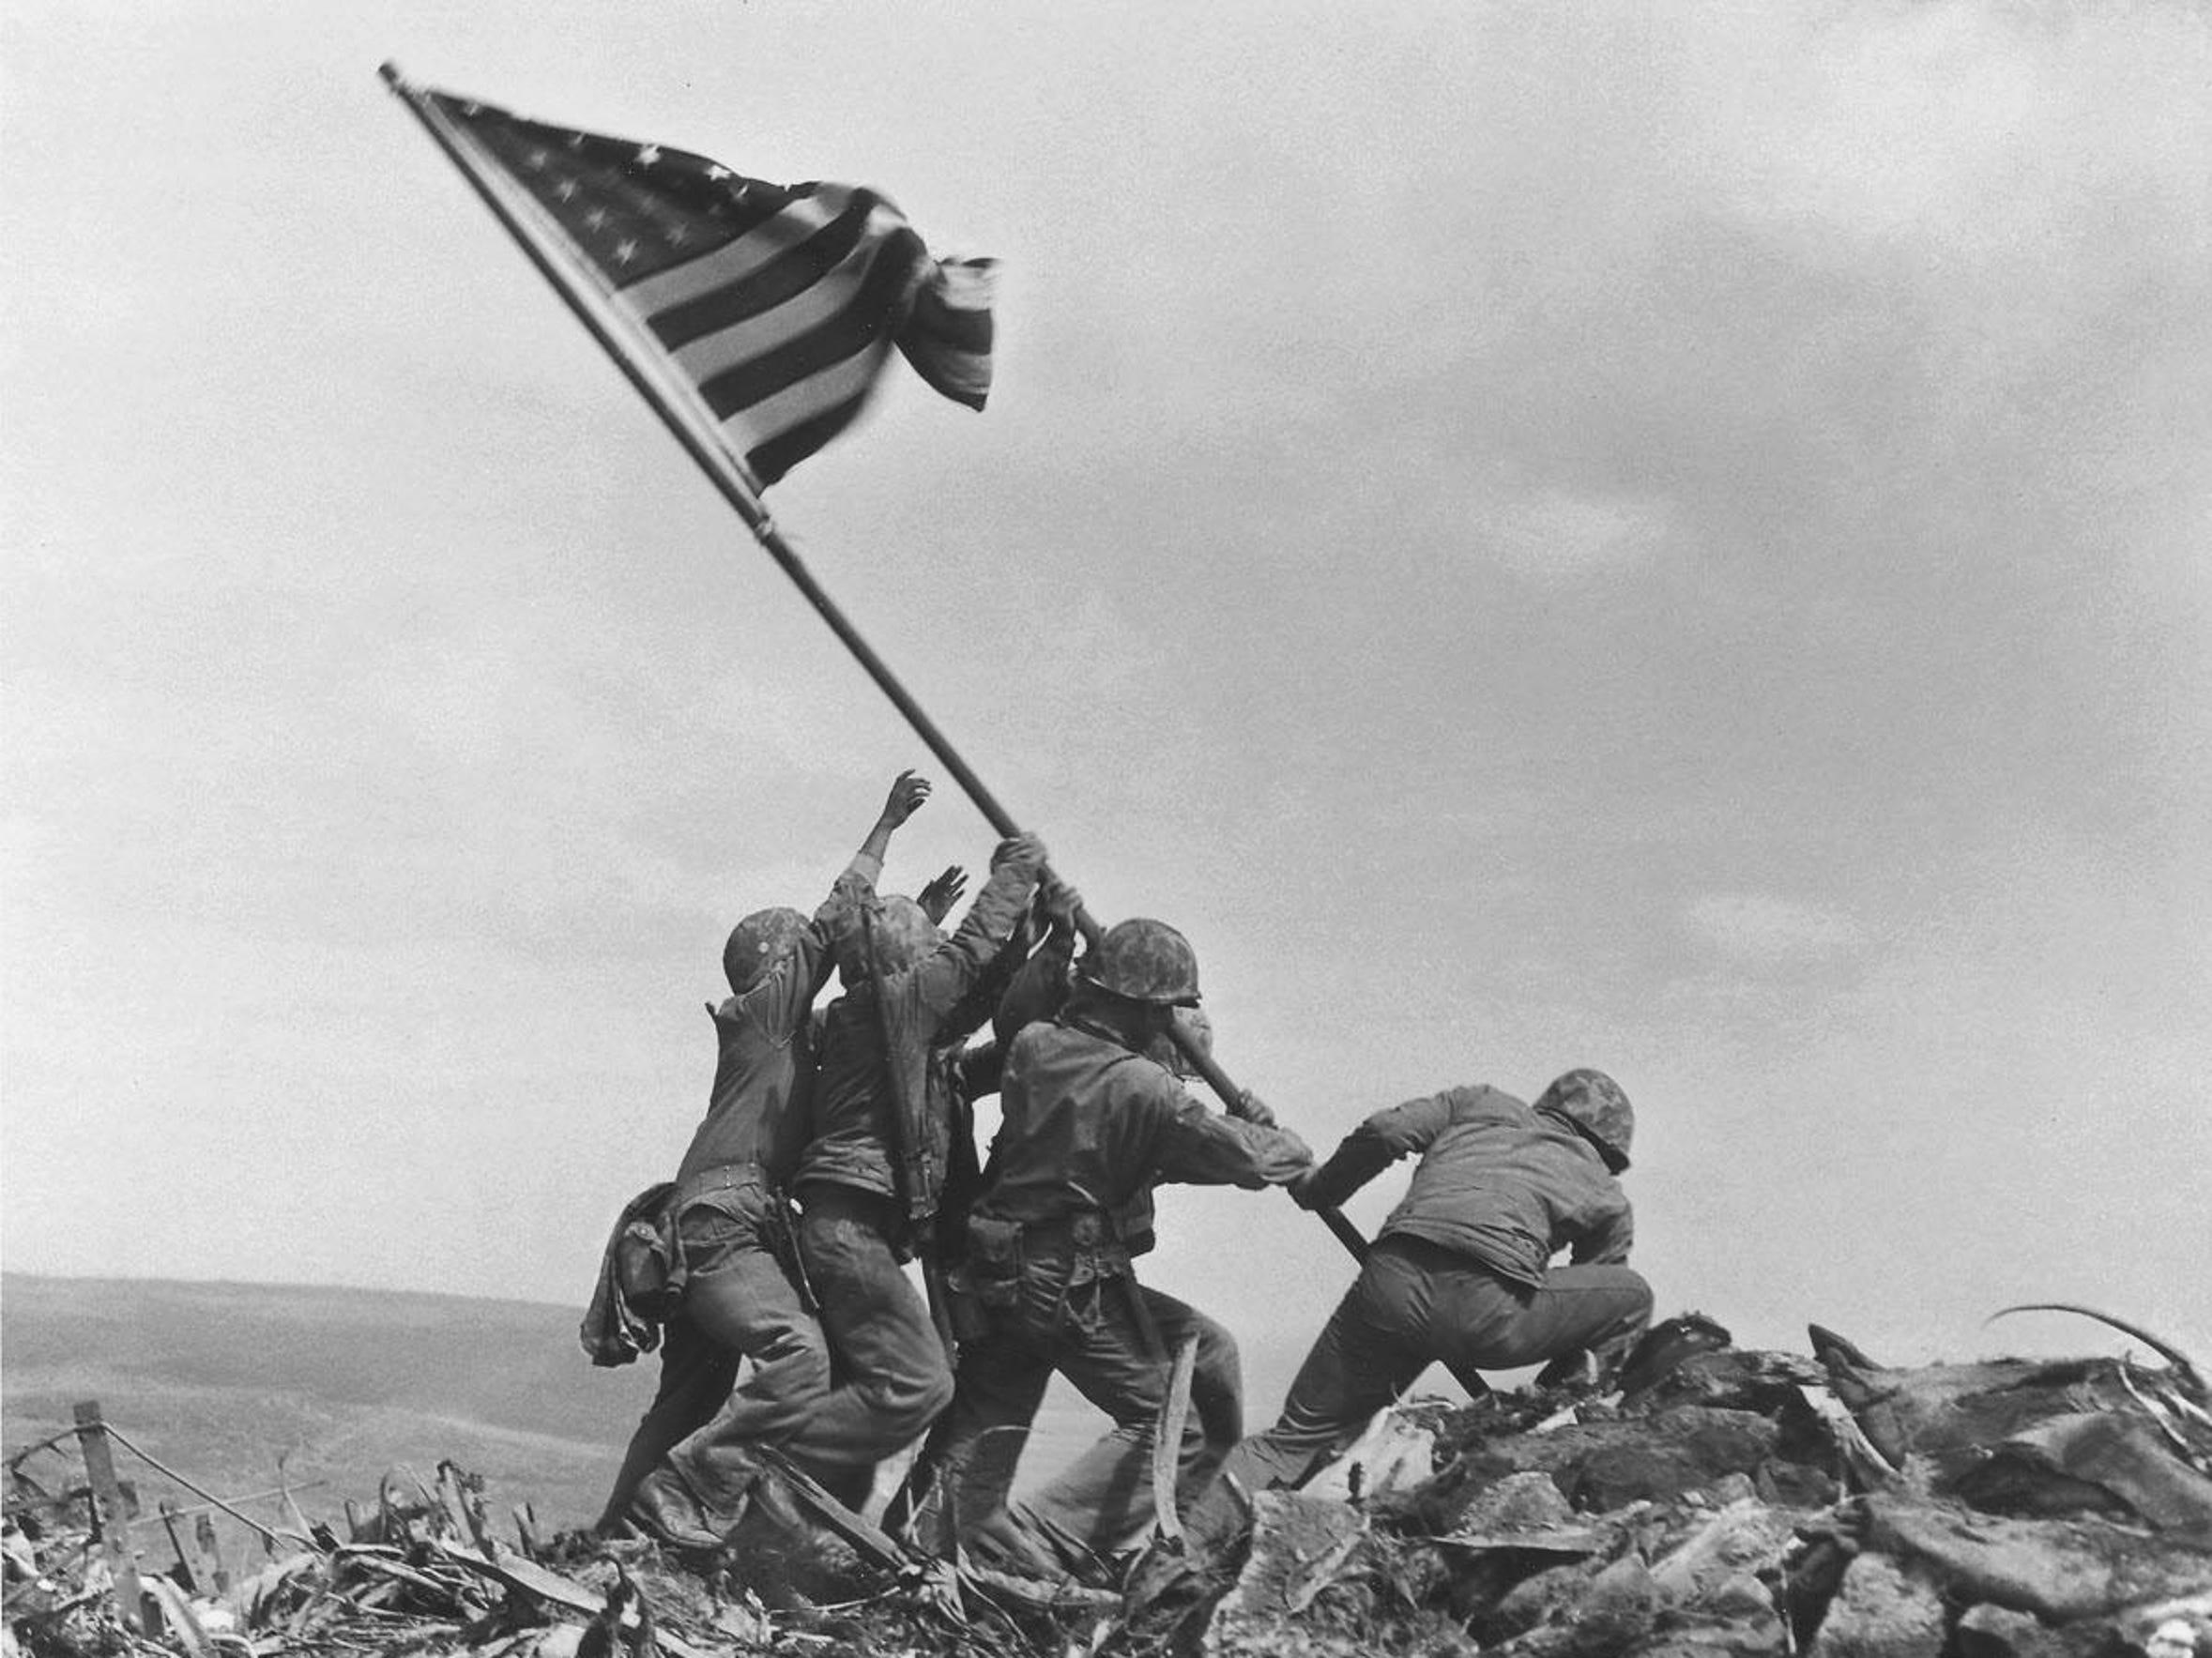 U.S. soldiers on Feb. 23, 1945, raise the American flag atop Mount Suribachi, Iwo Jima, Japan.